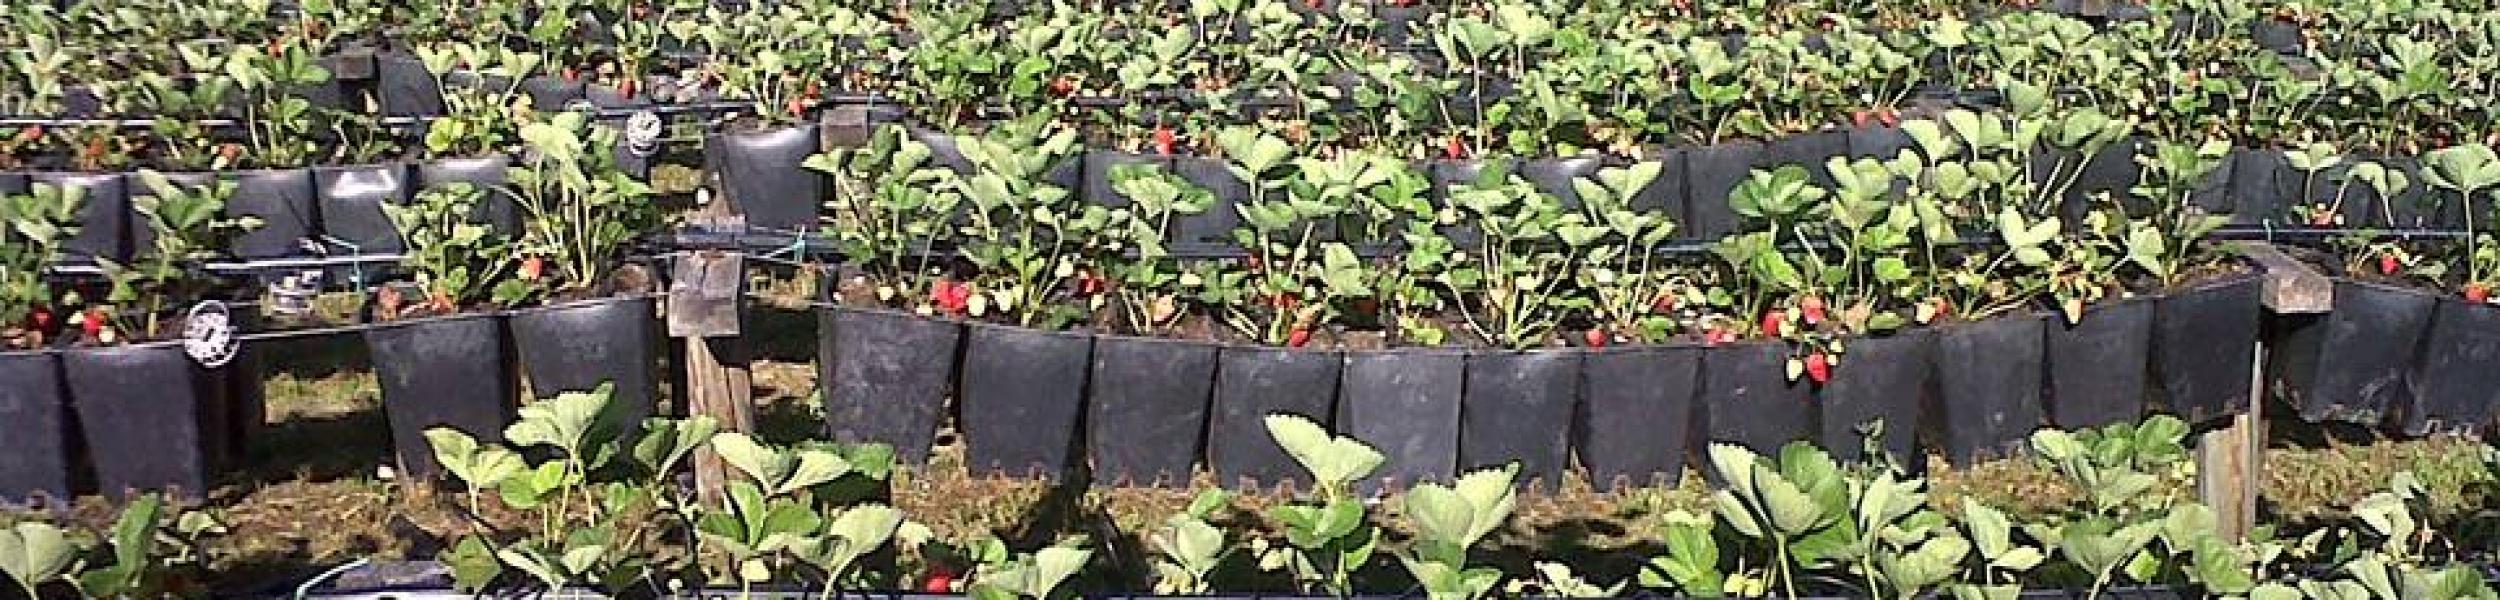 Comunità Martamaria, coltivazione di fragole biologiche